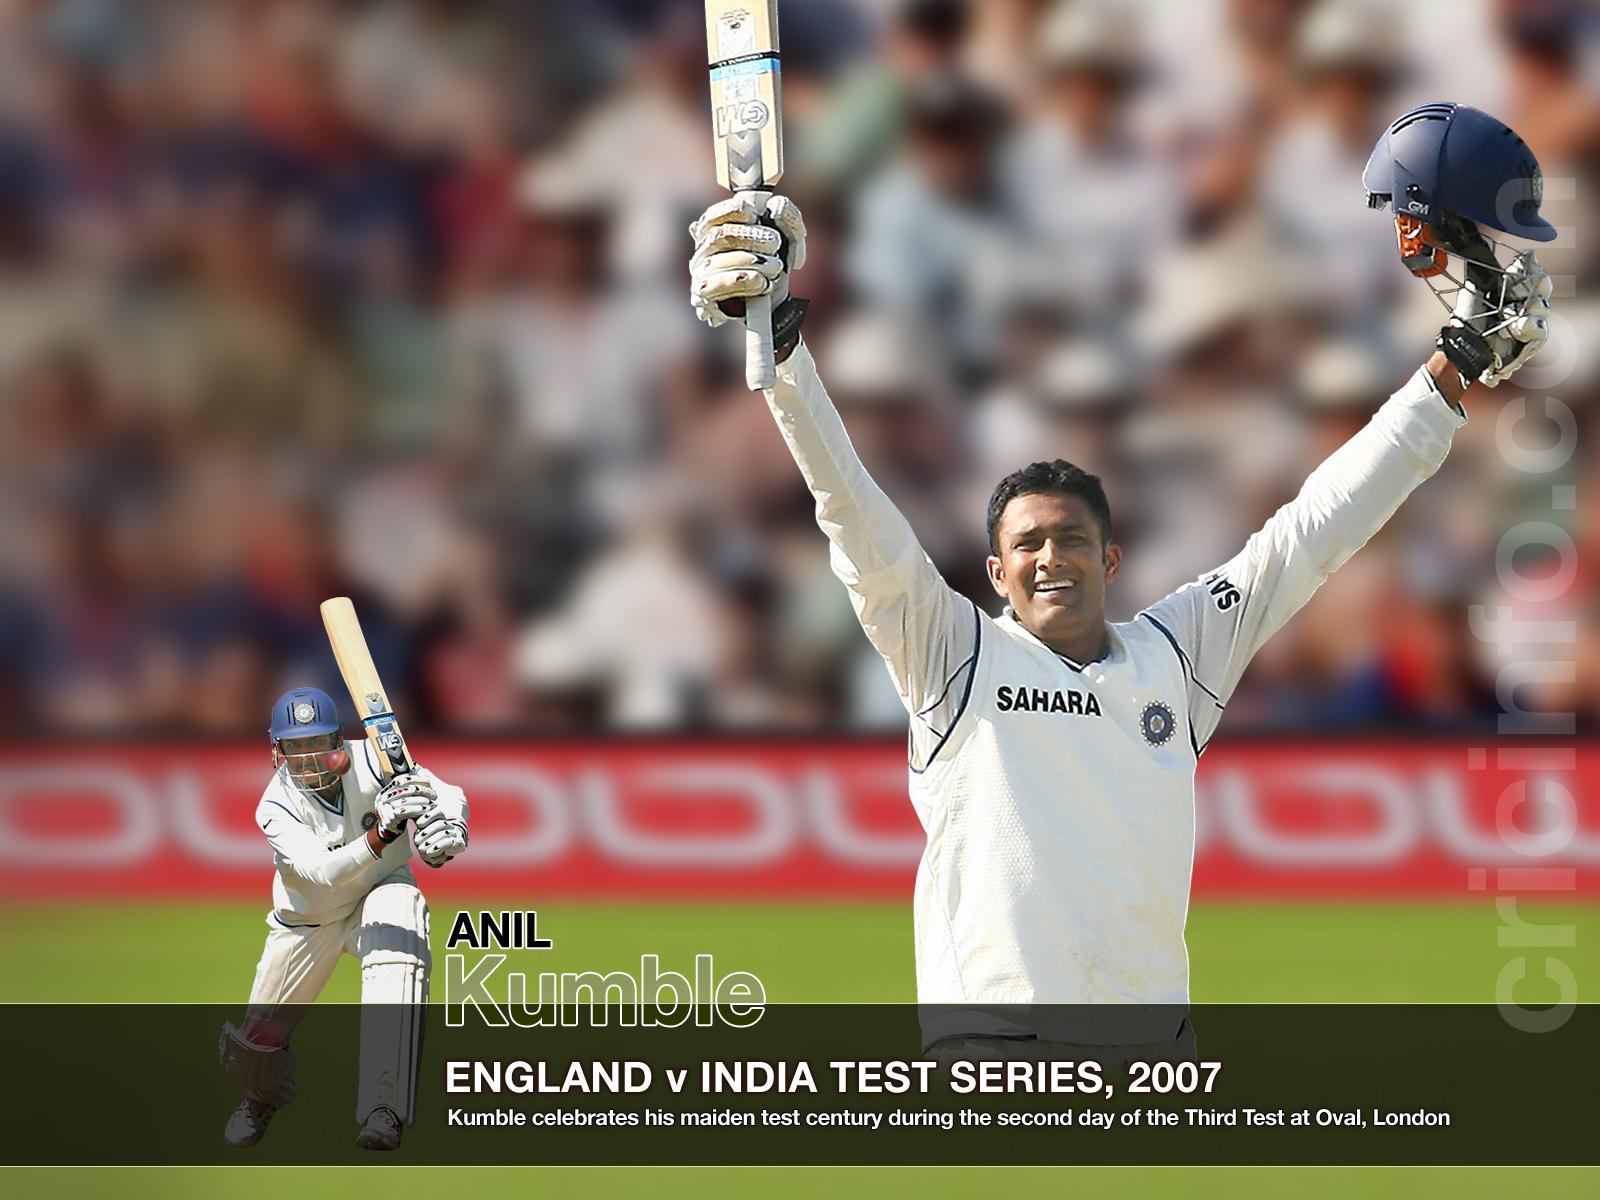 Kumble Celebrates His Maiden Test Century Cricket Wallpapers